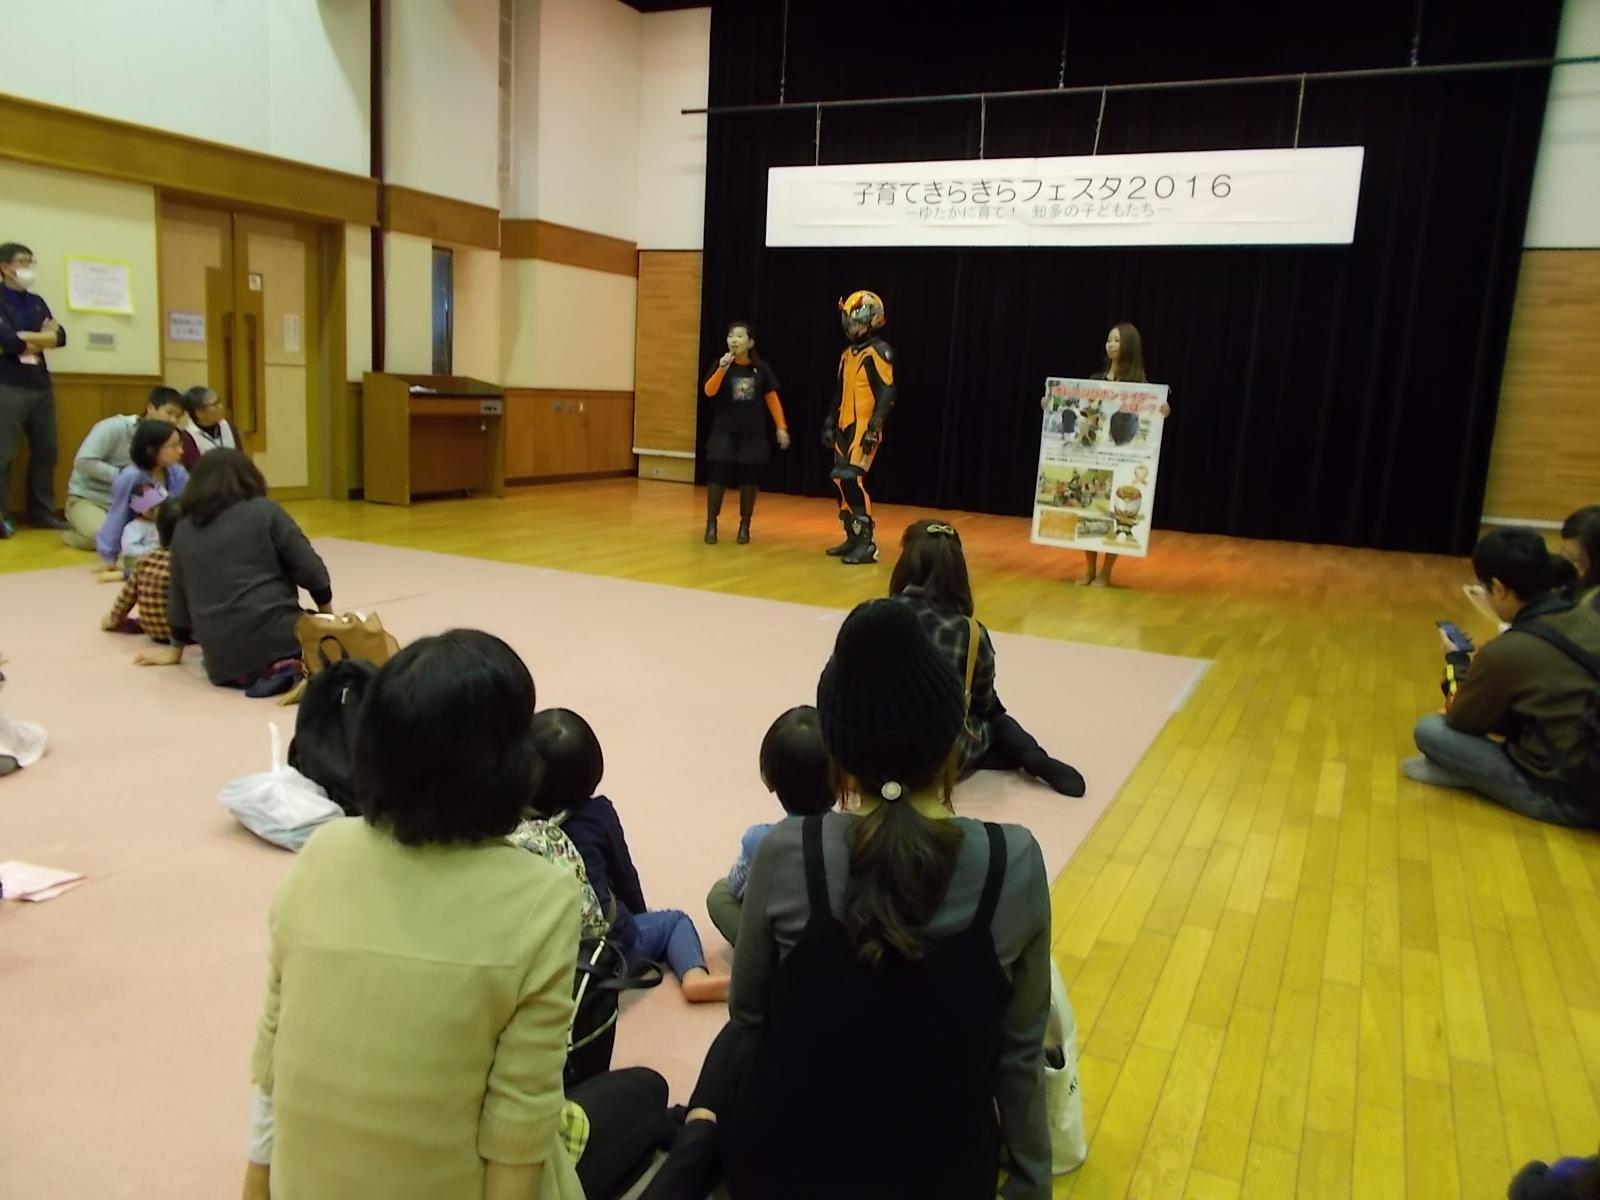 http://www.orangeribbon.jp/info/organization/images/DSCN2585.JPG